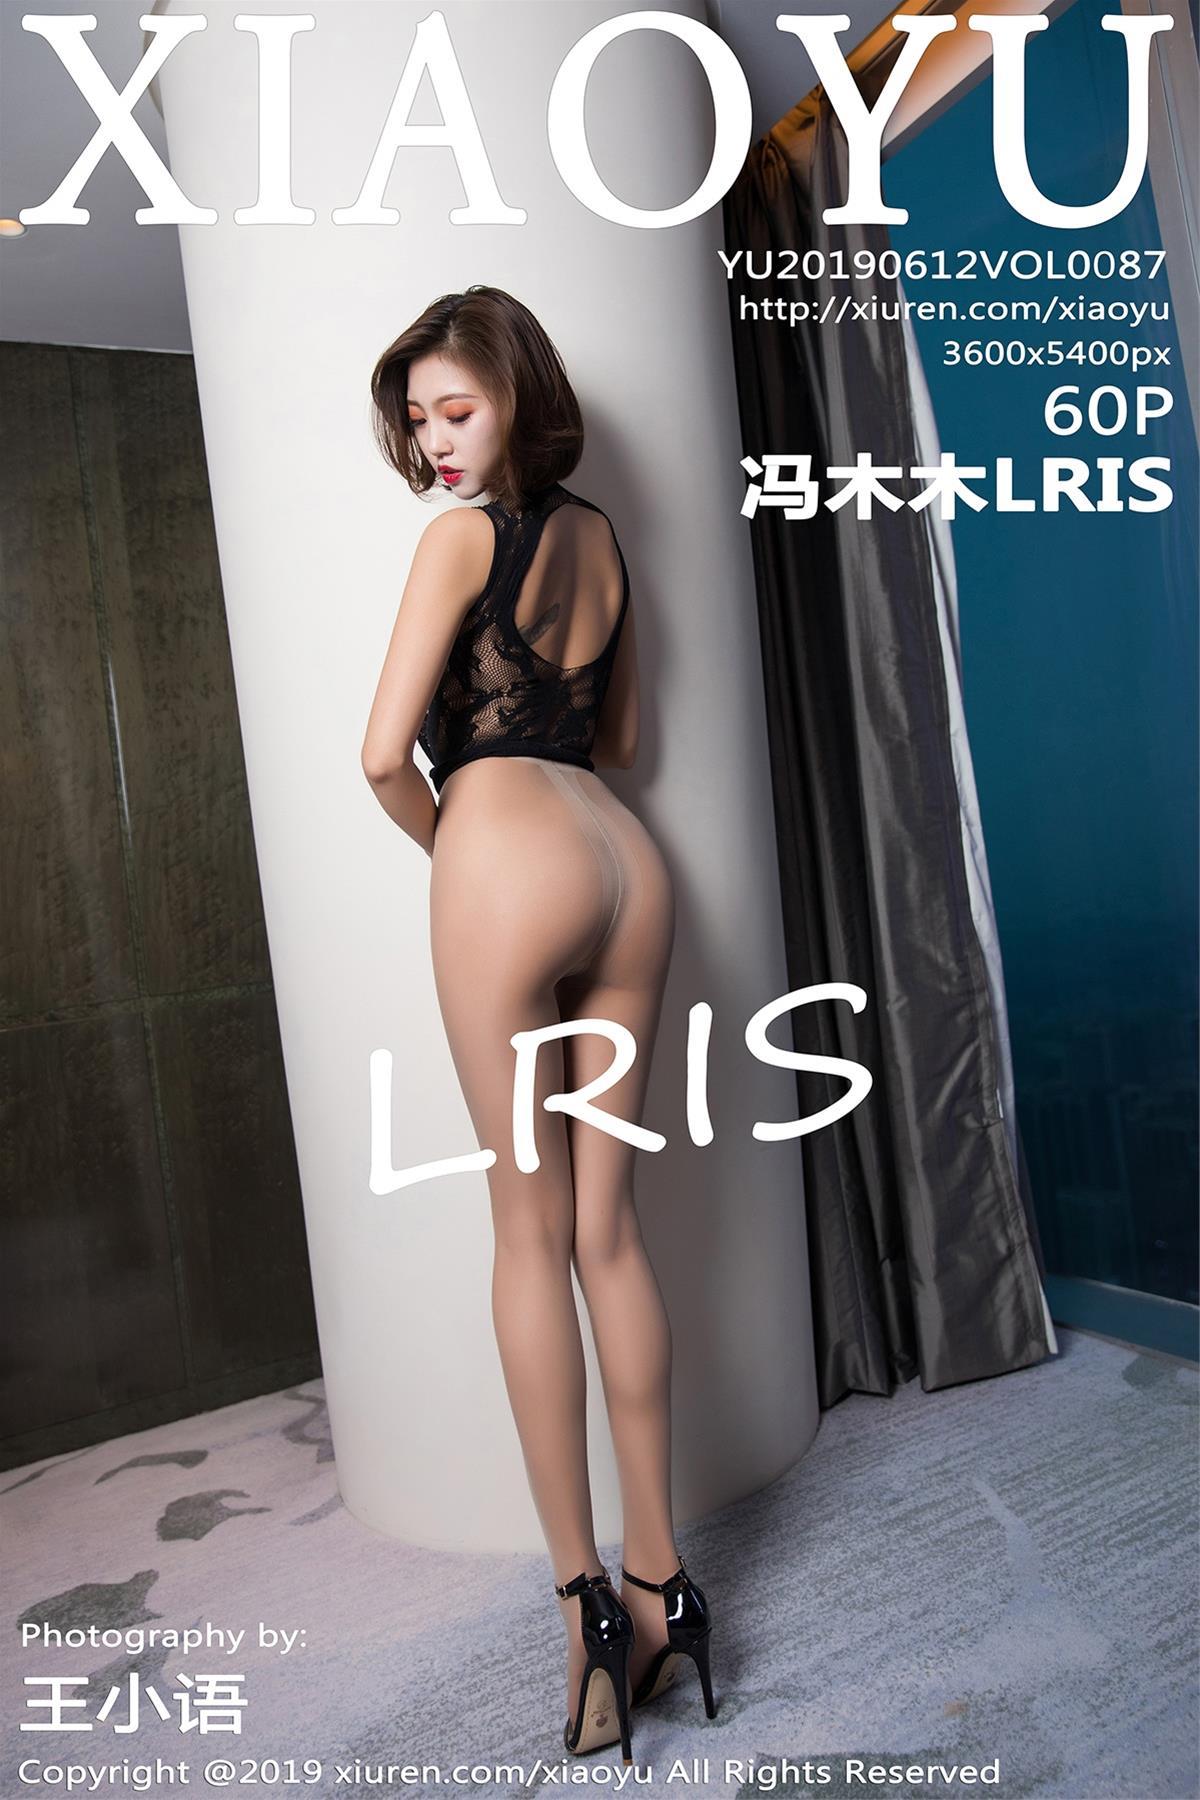 [XIAOYU] 语画界 2019.06.12 VOL.087 冯木木LRIS [60P-231MB] 人气女神-第1张